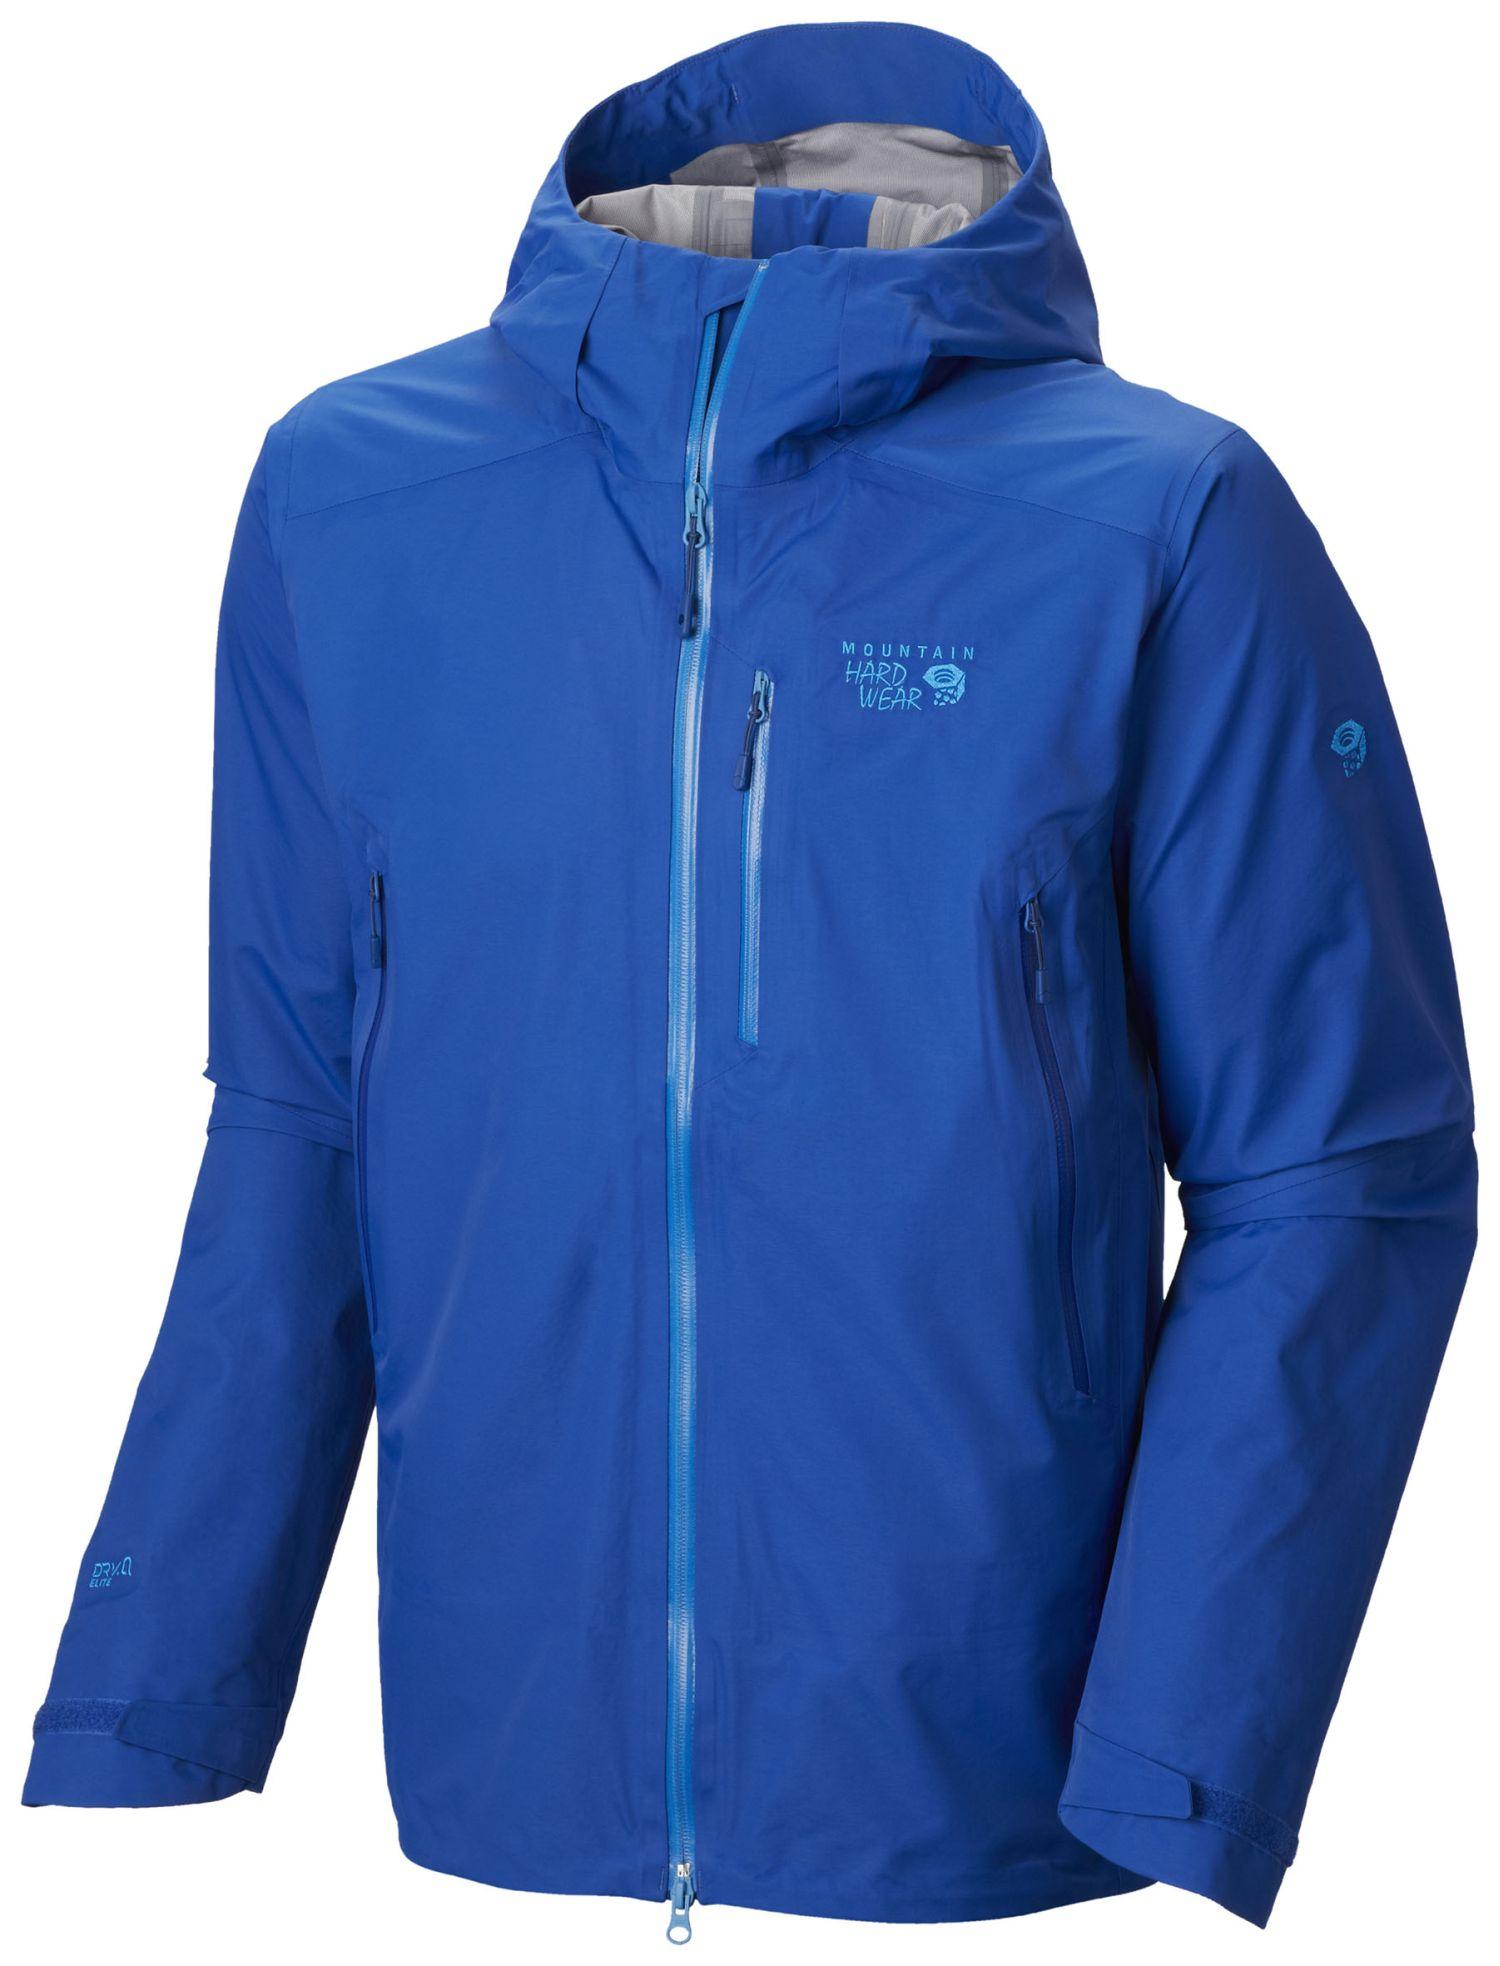 Torsun Jacket - Foto: Mountain Hardwear